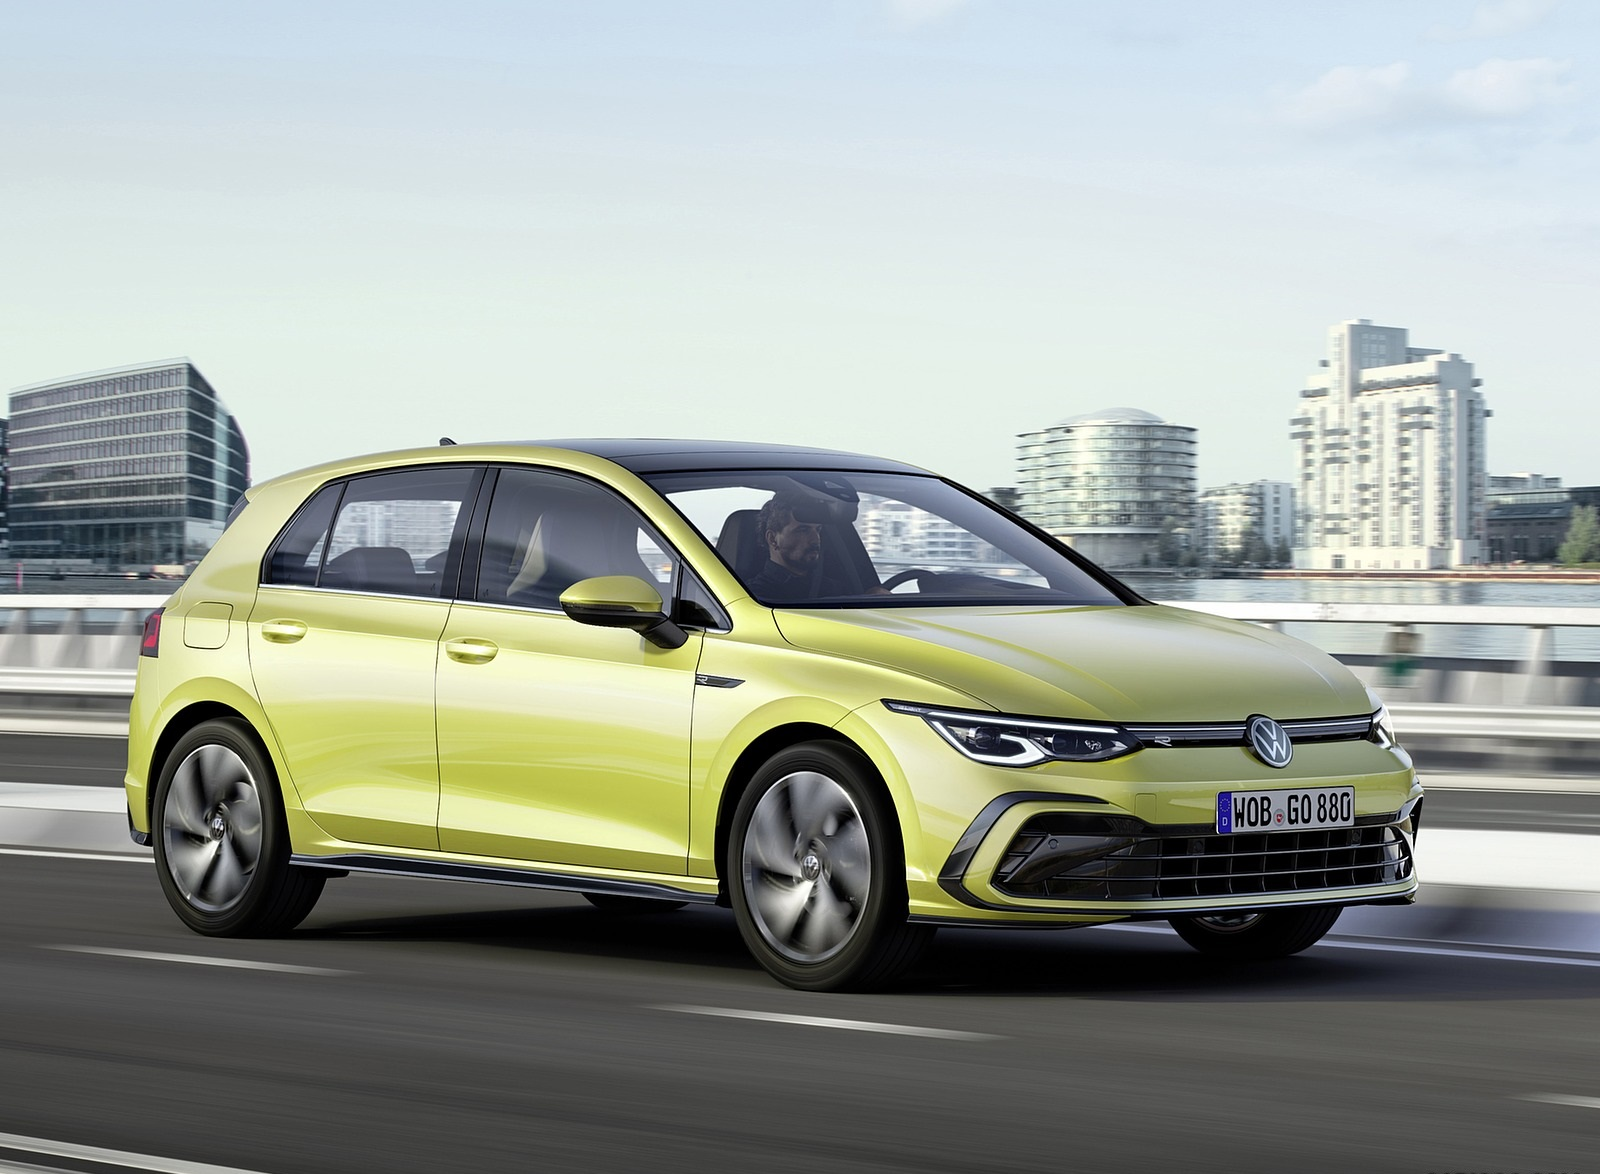 2020 Volkswagen Golf Mk8 Front Three-Quarter Wallpapers (1)